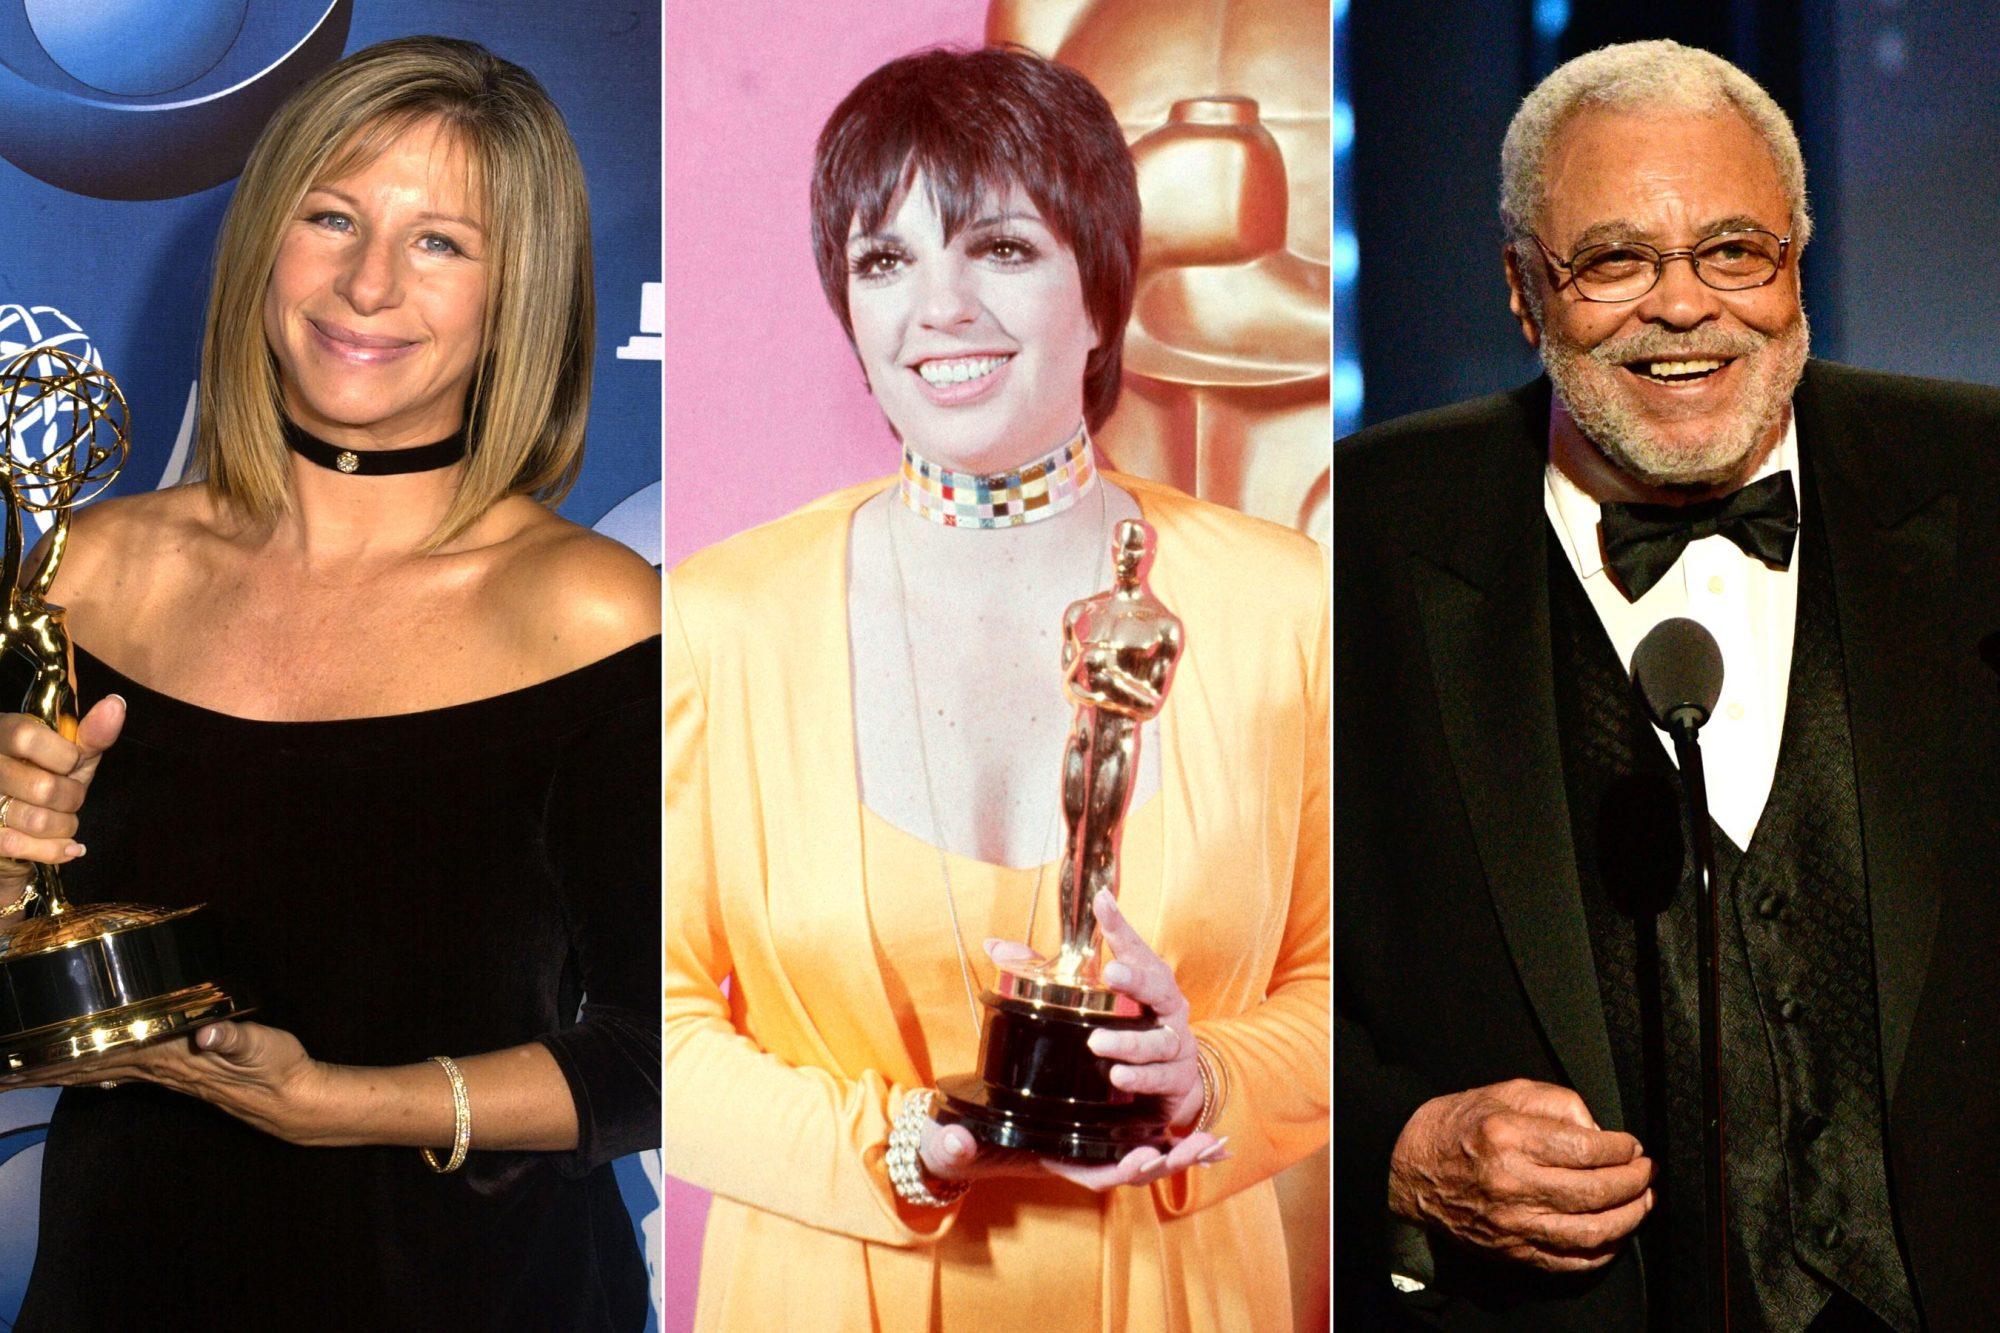 Barbra-Streisand,-Liza-Minnelli,-and-James-Earl-Jones